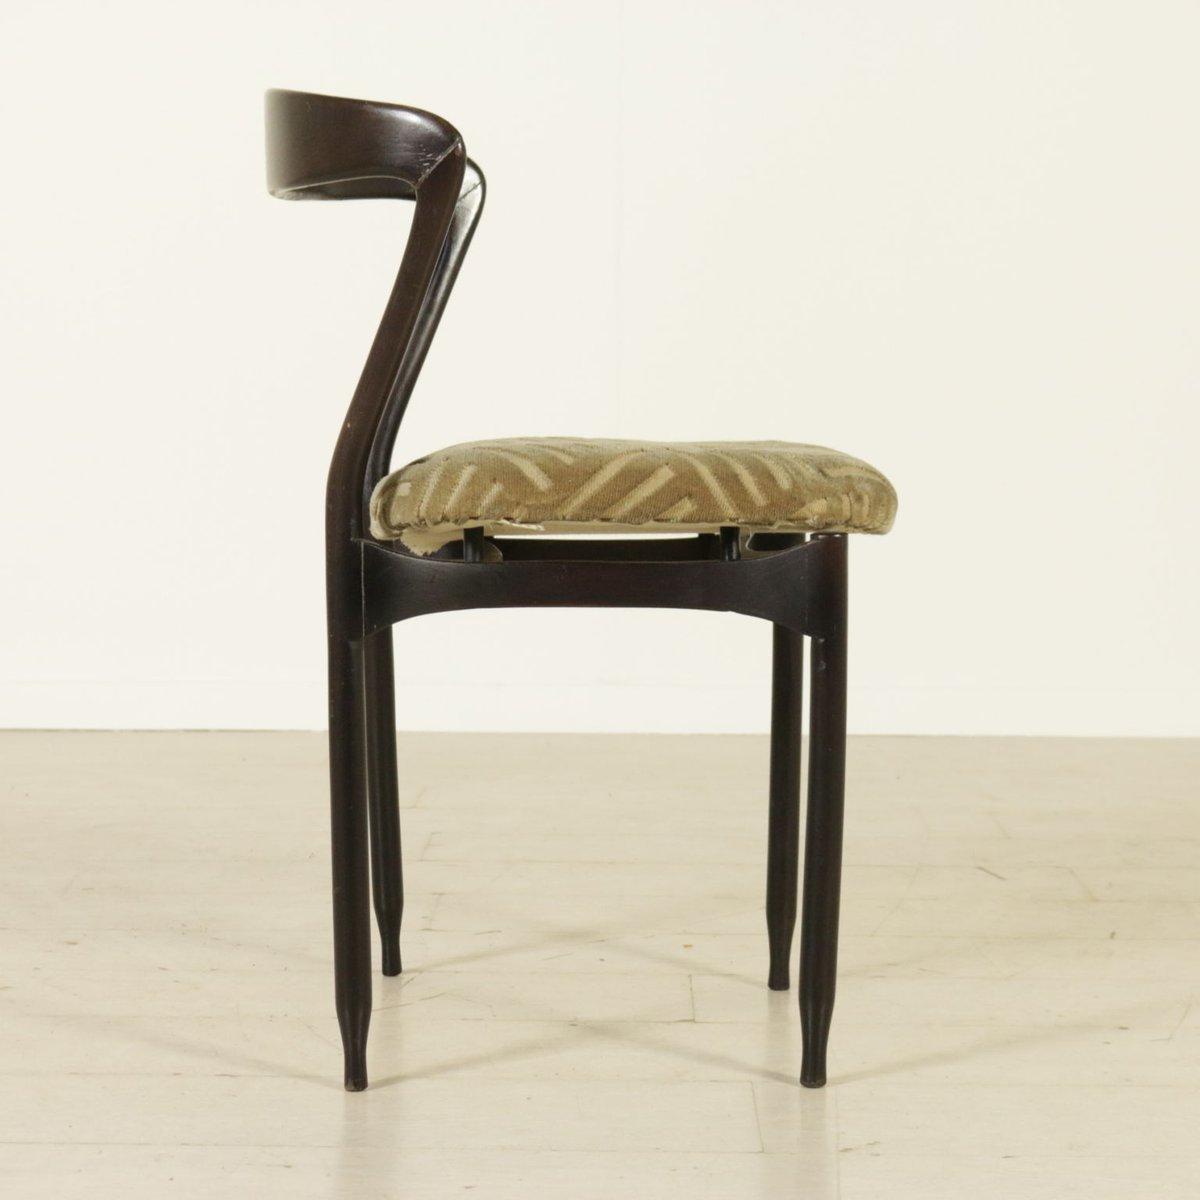 ebonisierte italienische st hle aus gebeiztem holz 1960er 4er set bei pamono kaufen. Black Bedroom Furniture Sets. Home Design Ideas